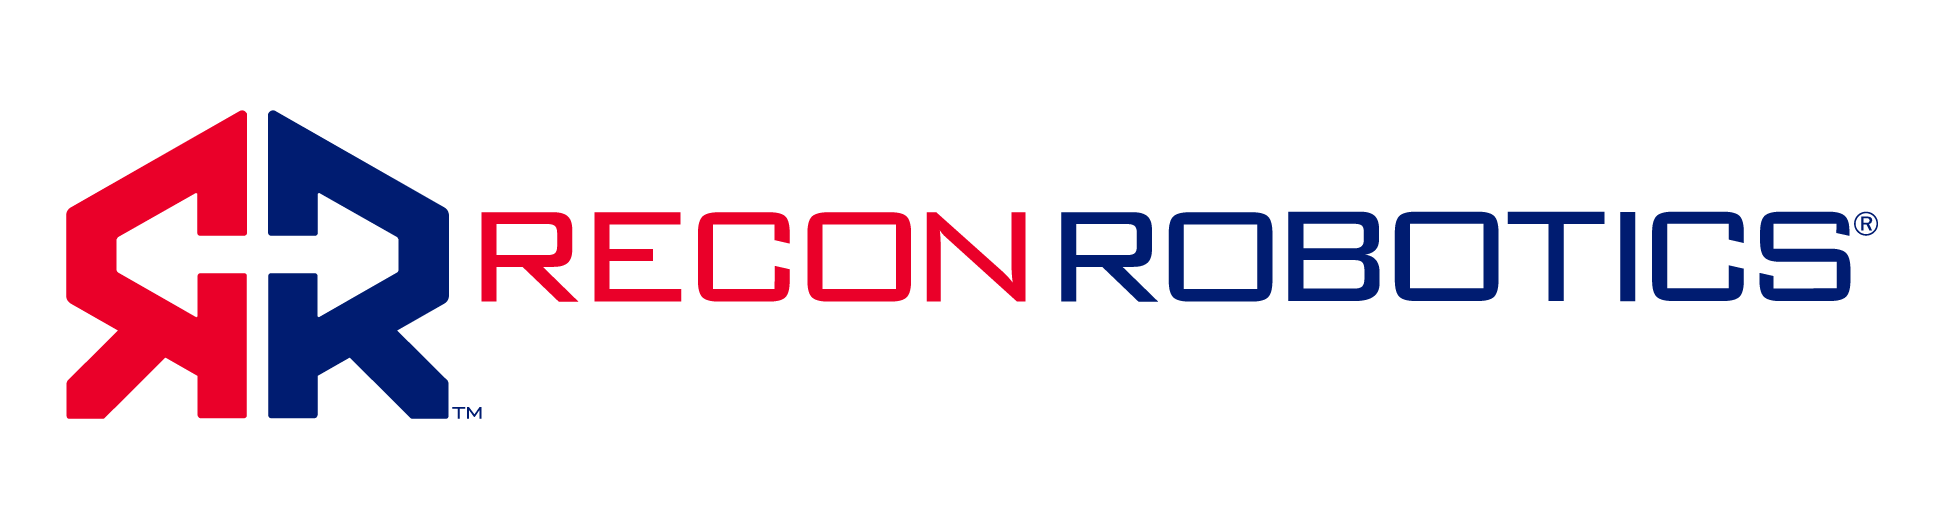 ReconRobotics_Logo_Horizontal_RGB.png